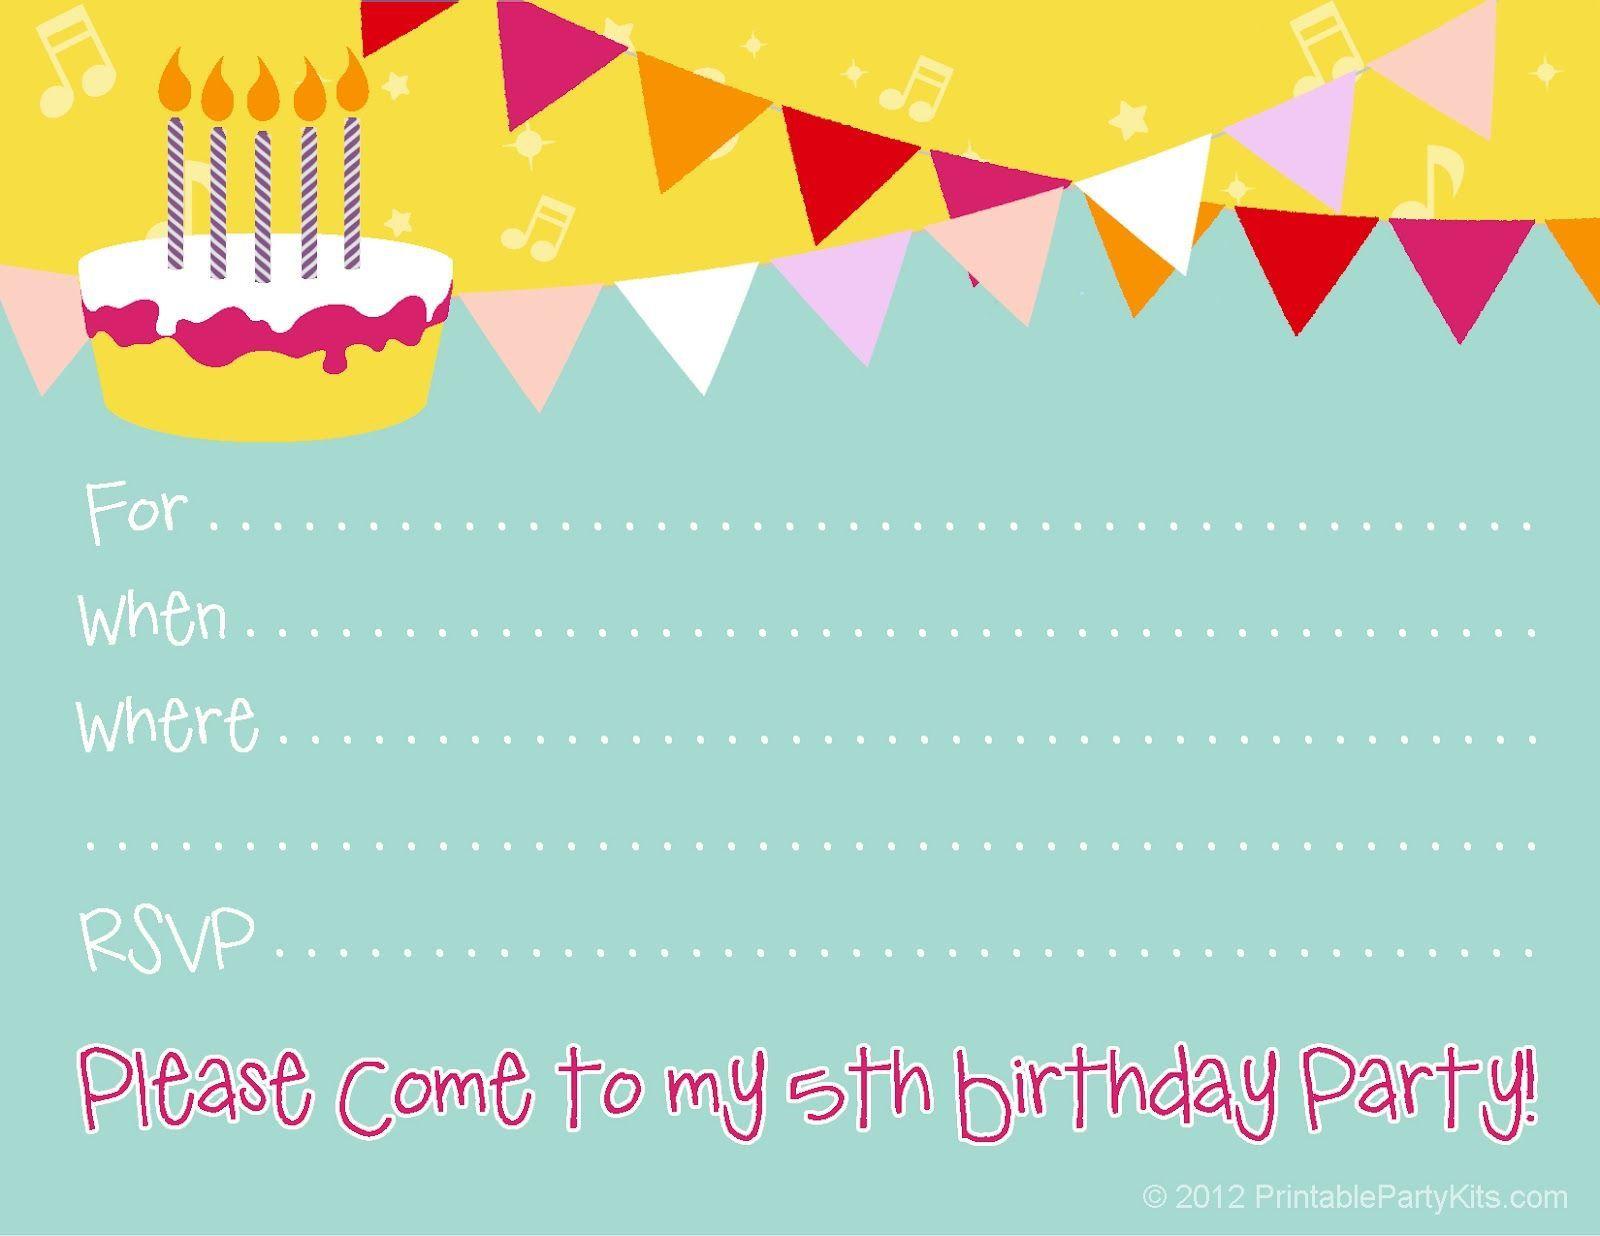 007 Dreaded Free Online Printable Birthday Invitation Template Design  Templates Card MakerFull